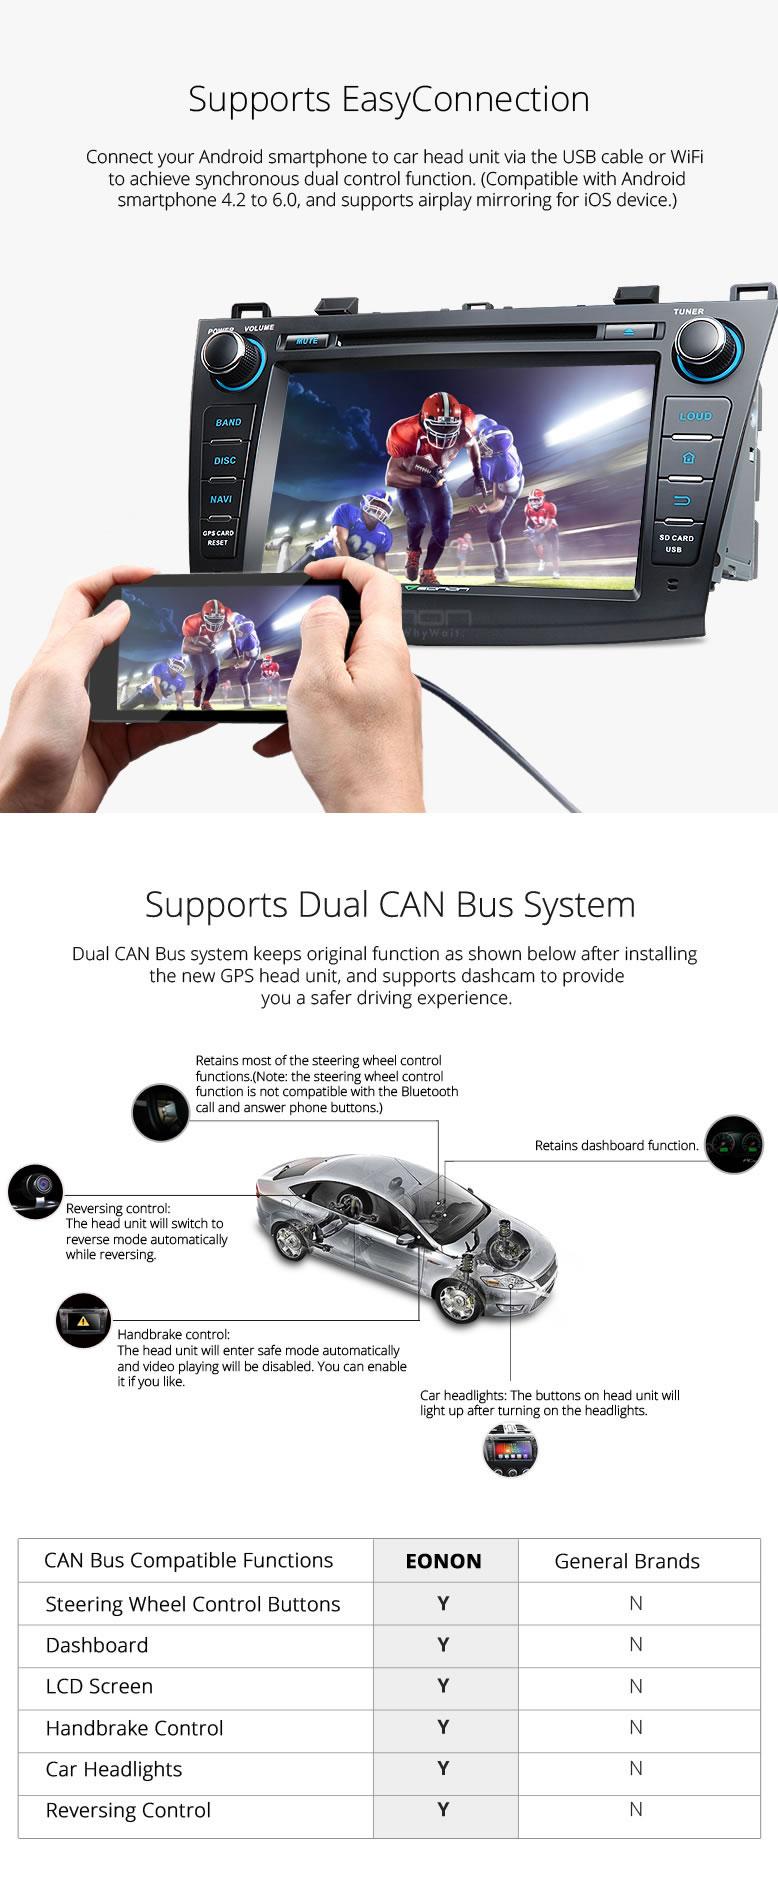 Eonon GA7163S | Mazda 3 2010 - 2013 Android 6 0 Car Radio Stereo 8